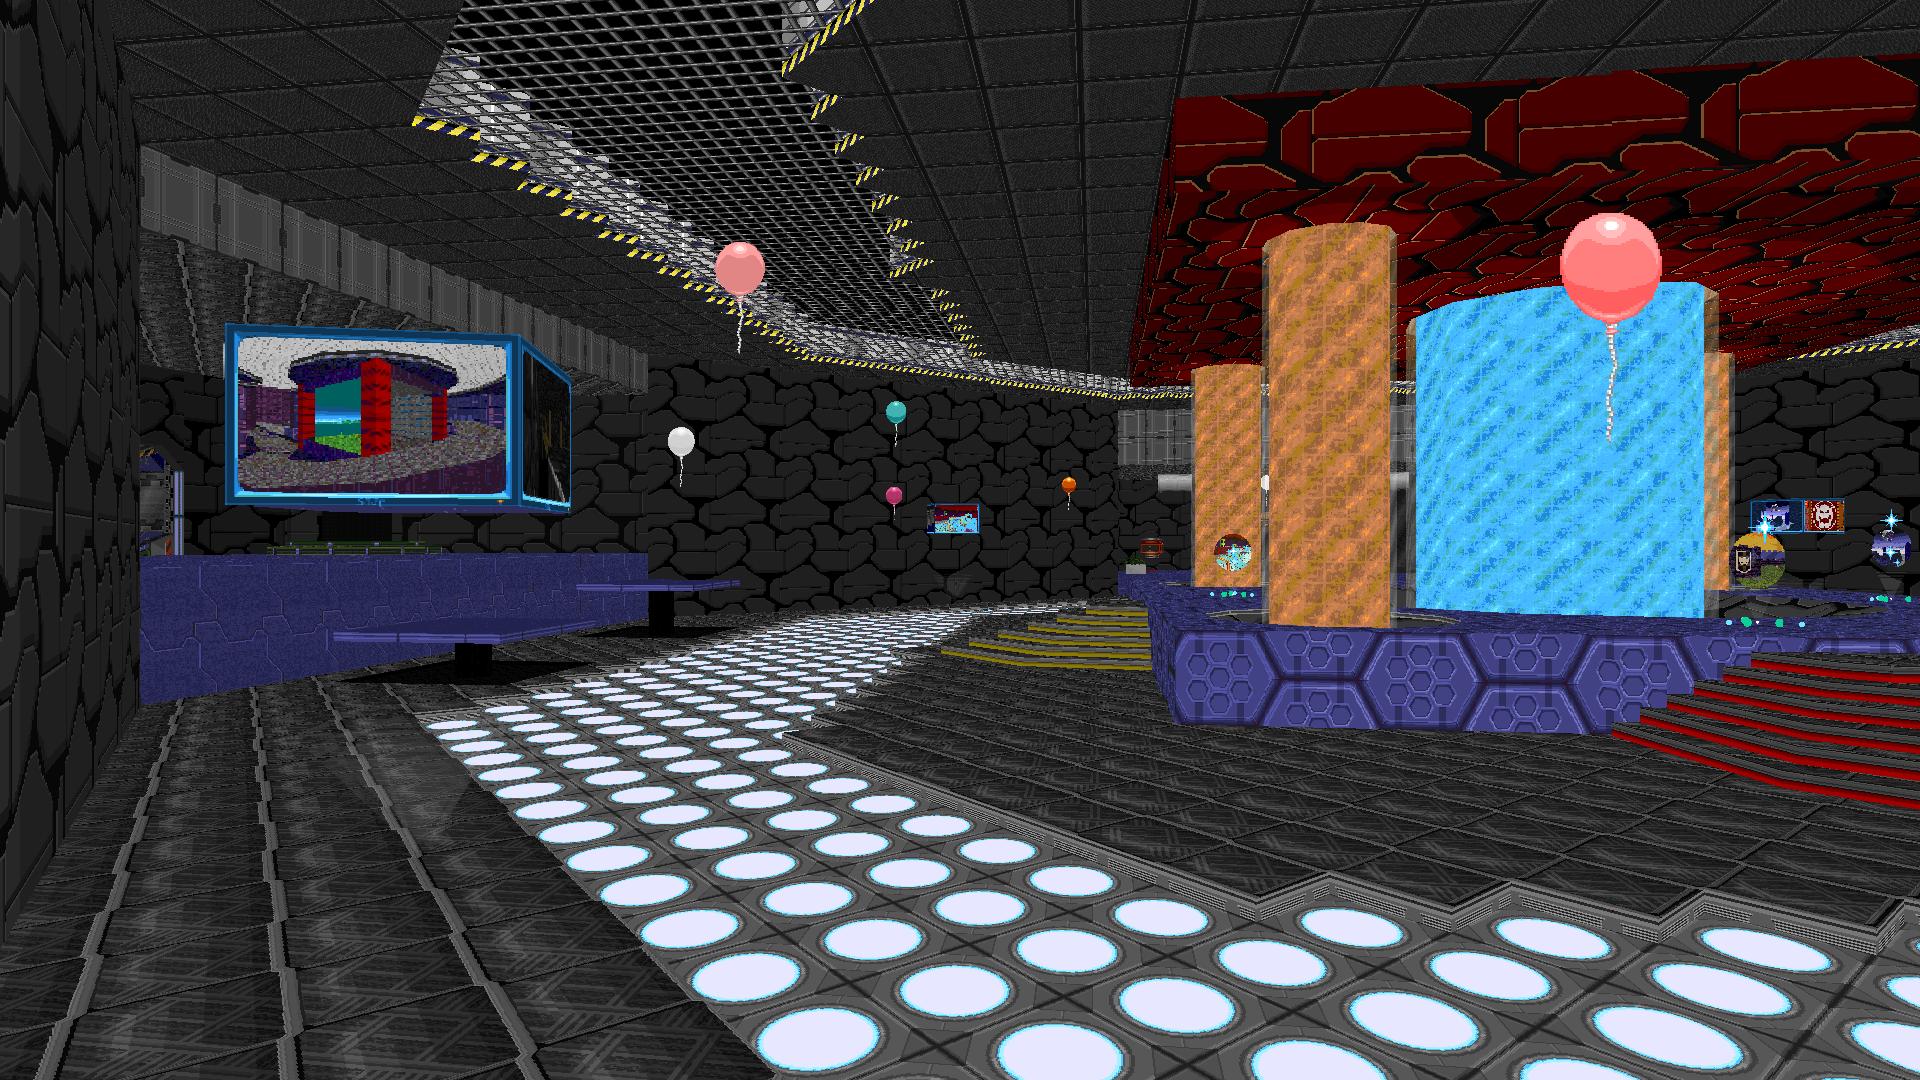 The hub awaits...